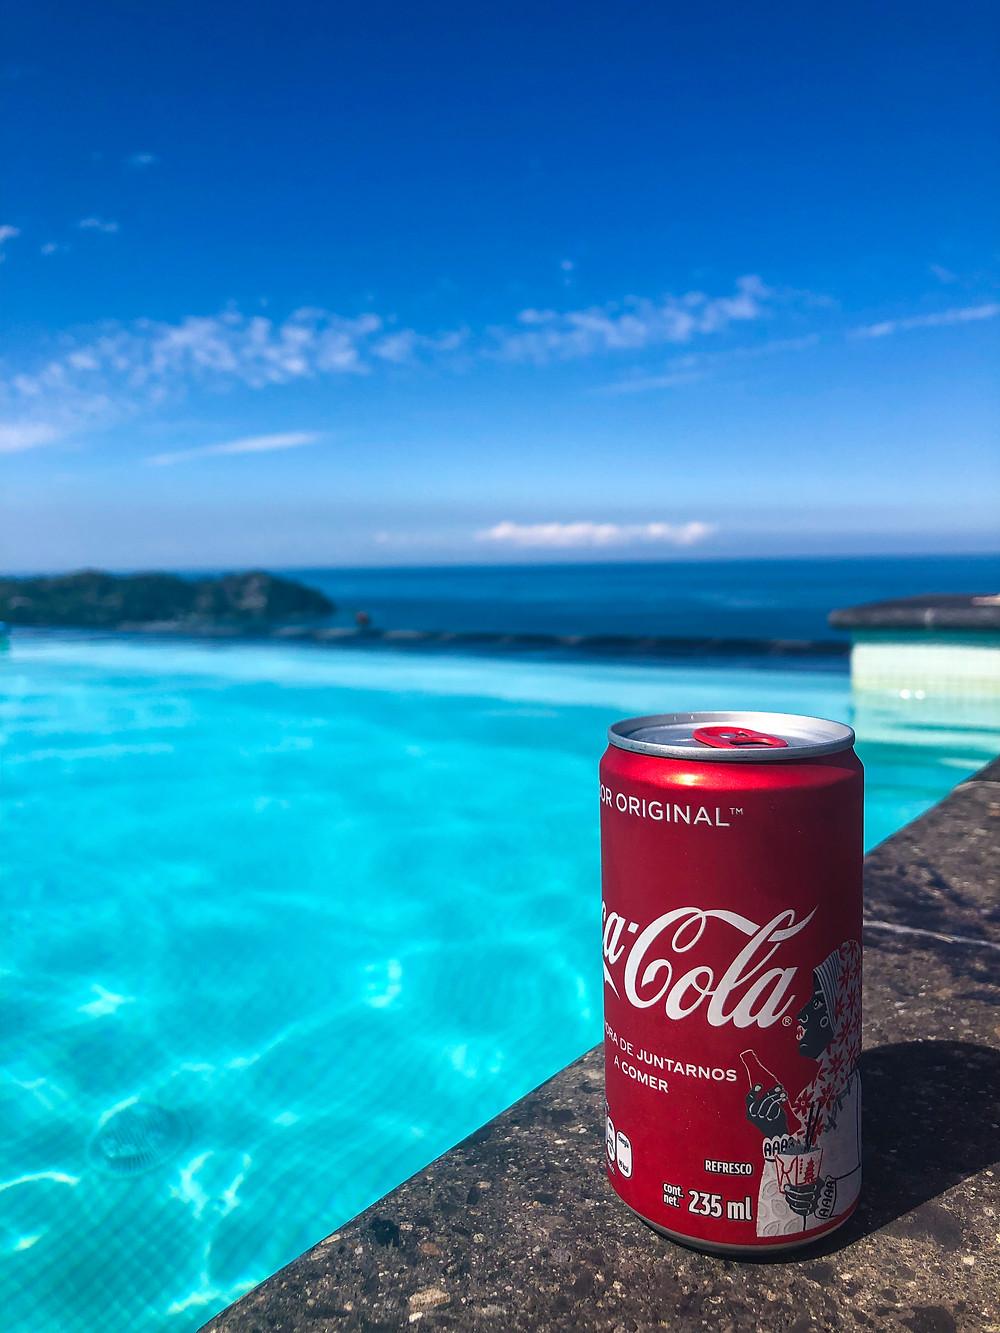 sayulita mexico pool coca cola tourist